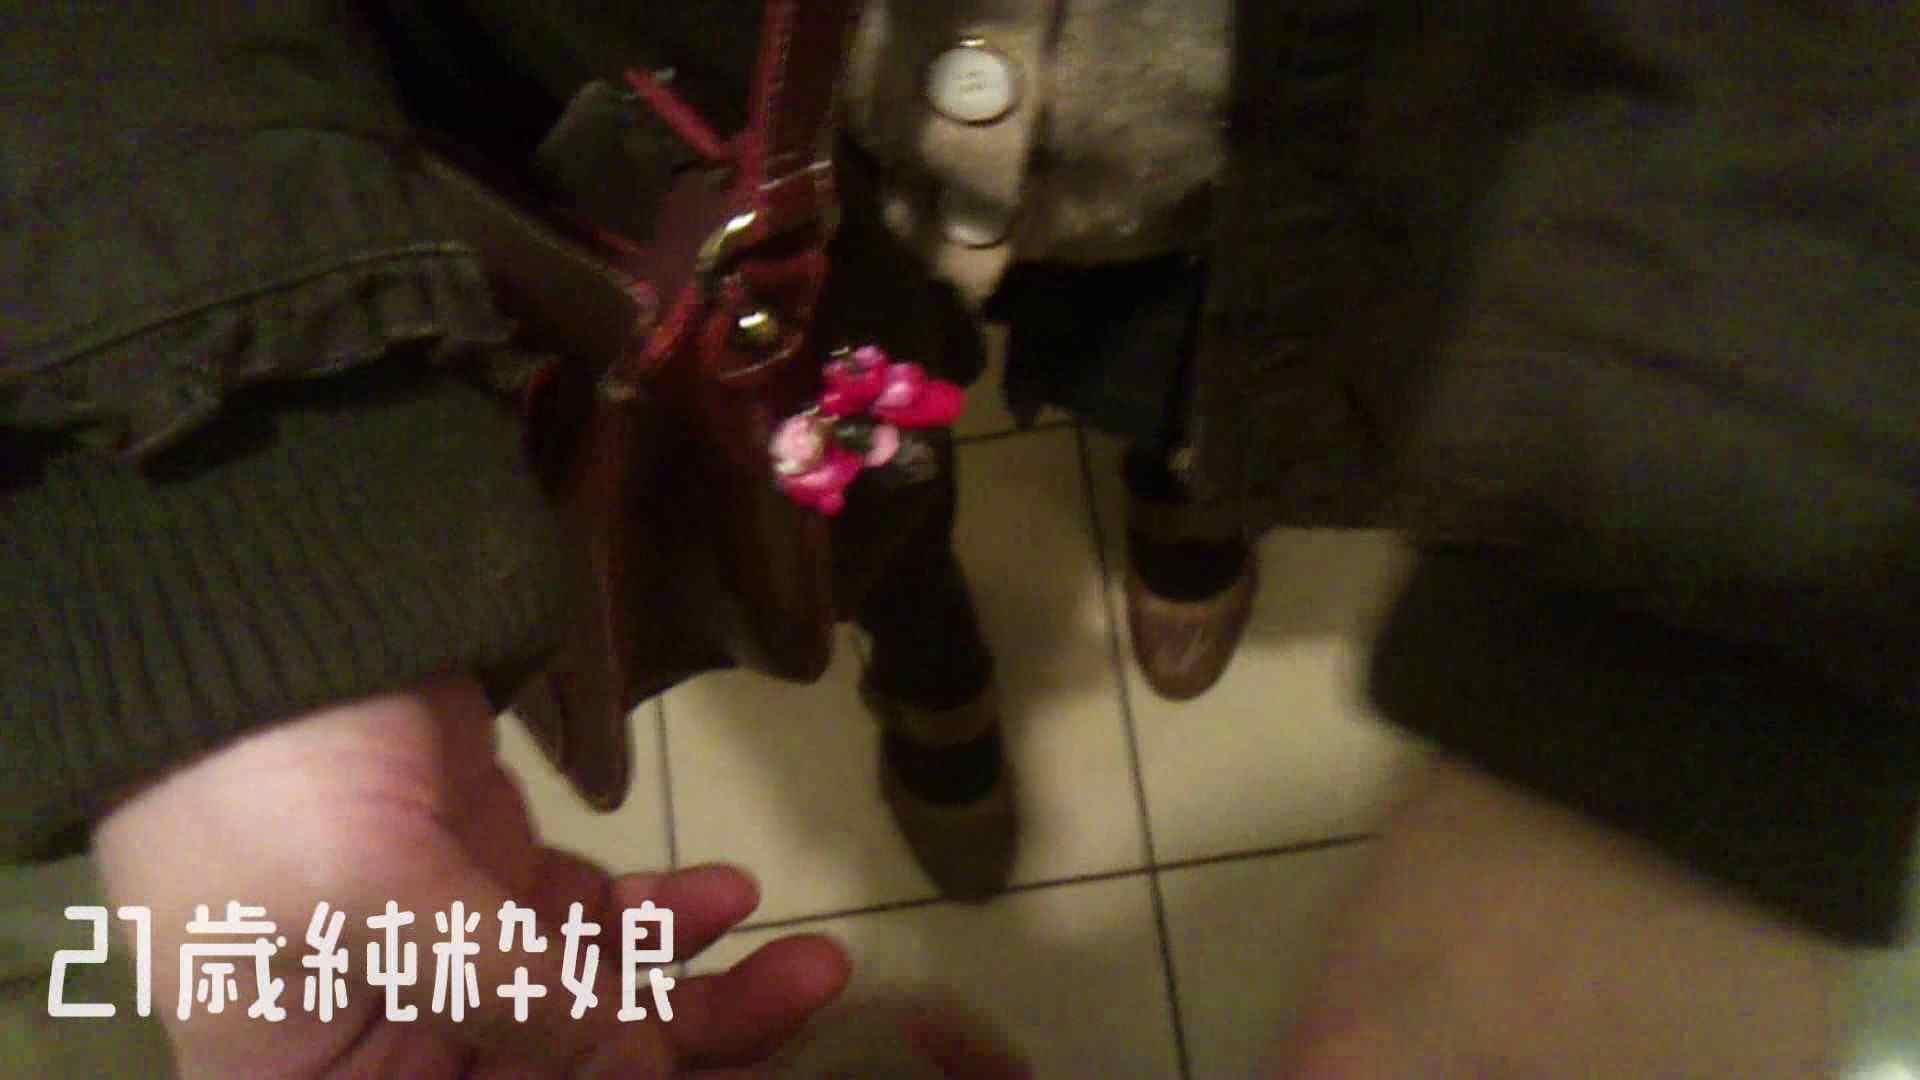 Gカップ21歳純粋嬢第2弾Vol.5 OLヌード天国  110PIX 30